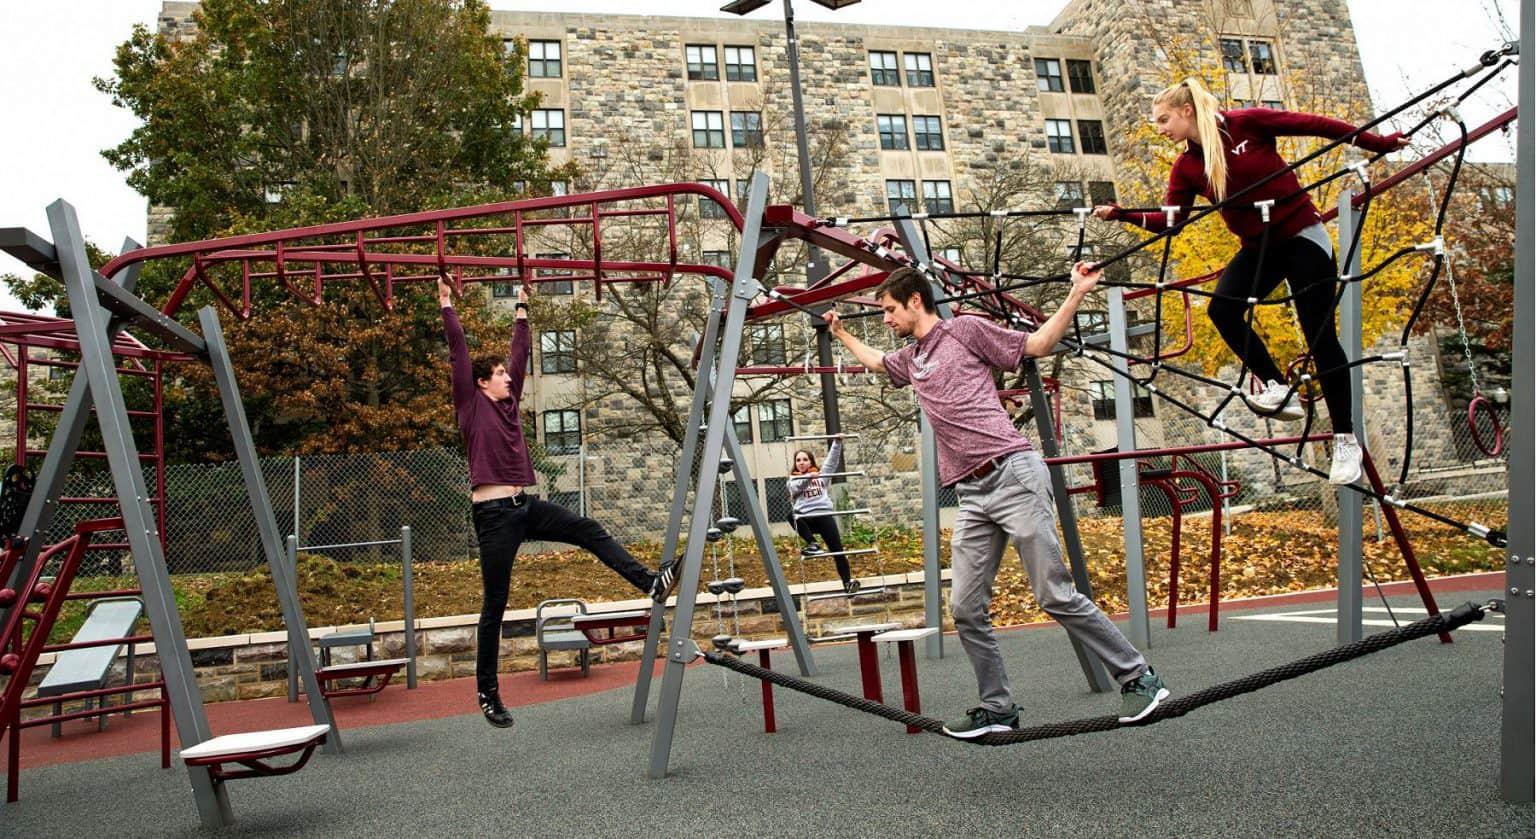 outdoor-fitness-equipment_49643787351_o-1536x839